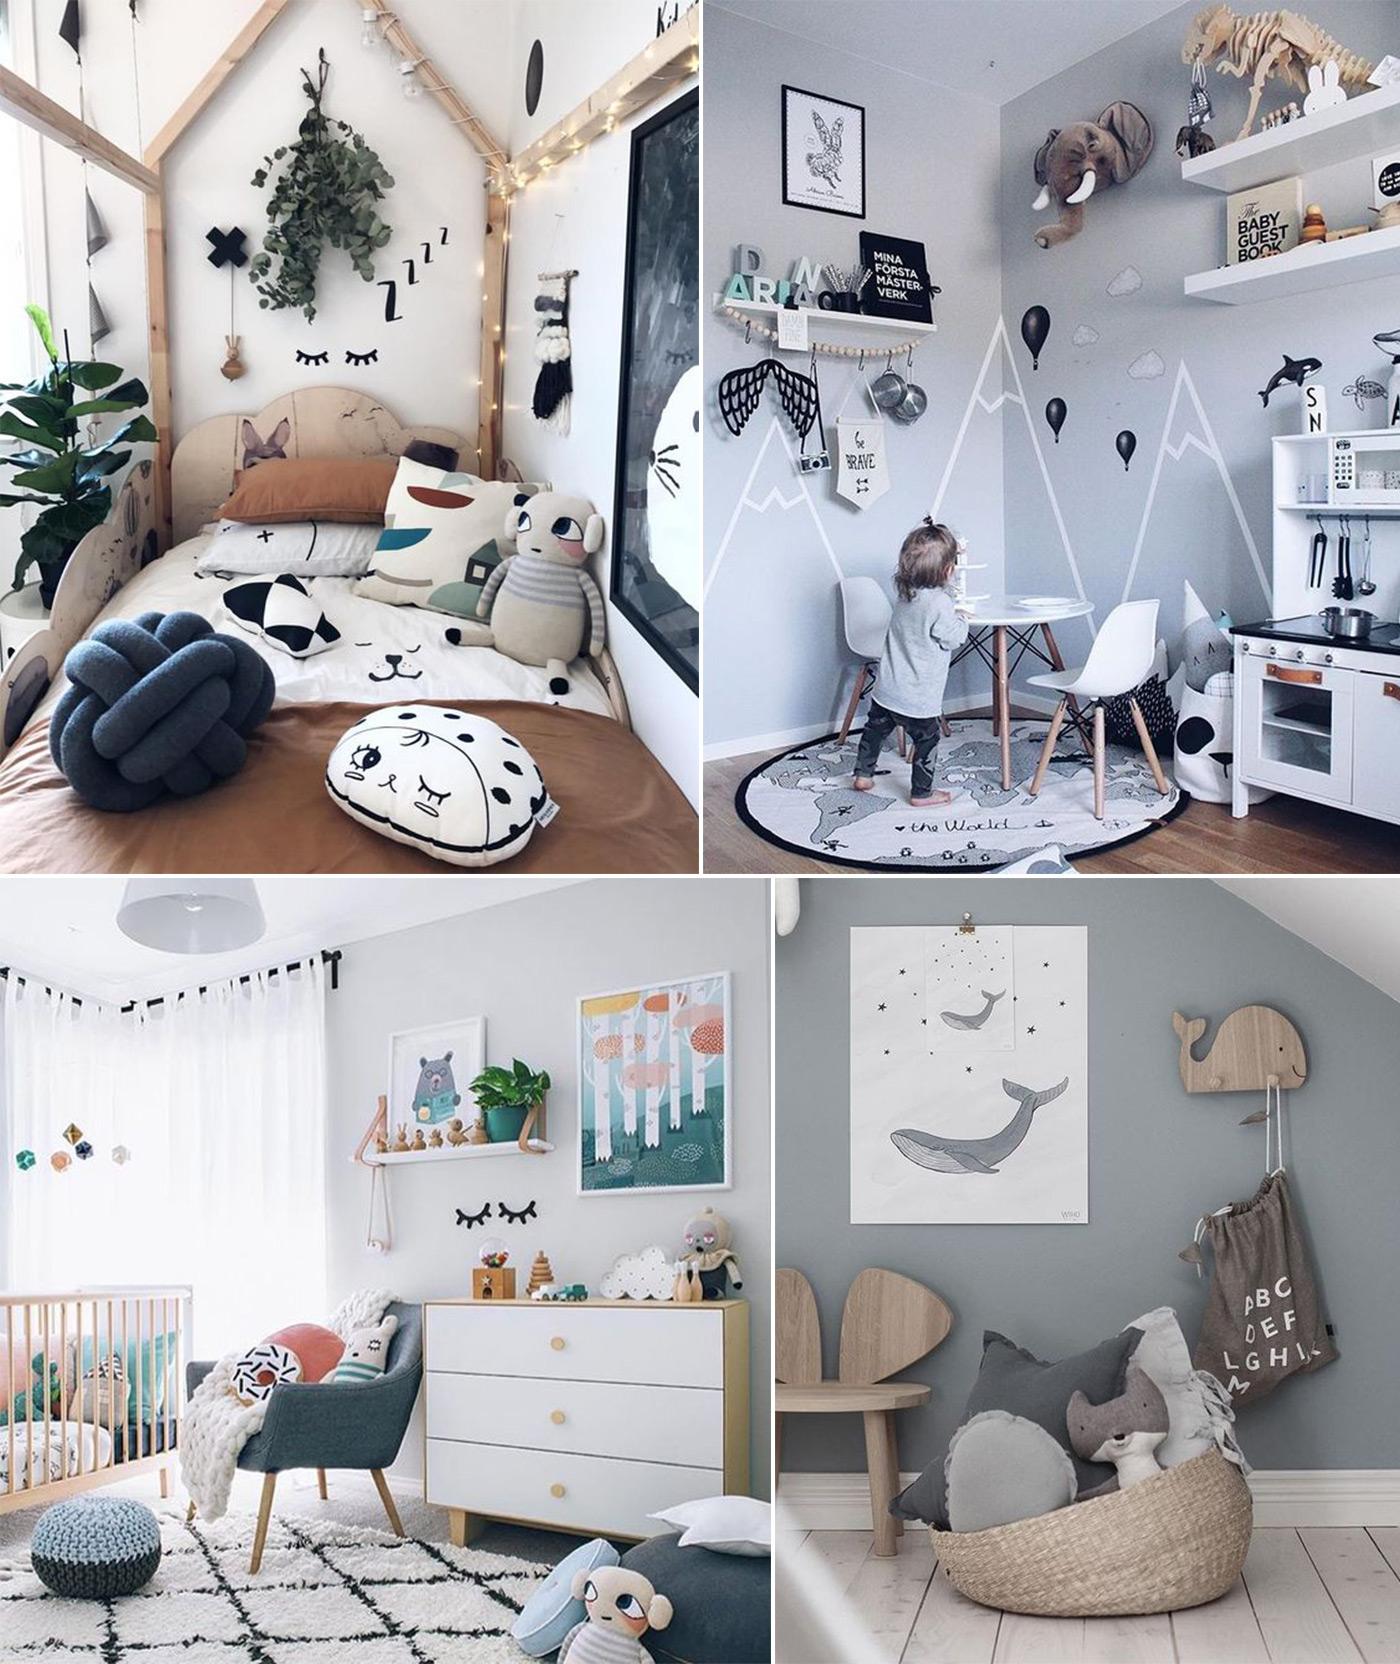 детская комната в скандинавском стиле фото